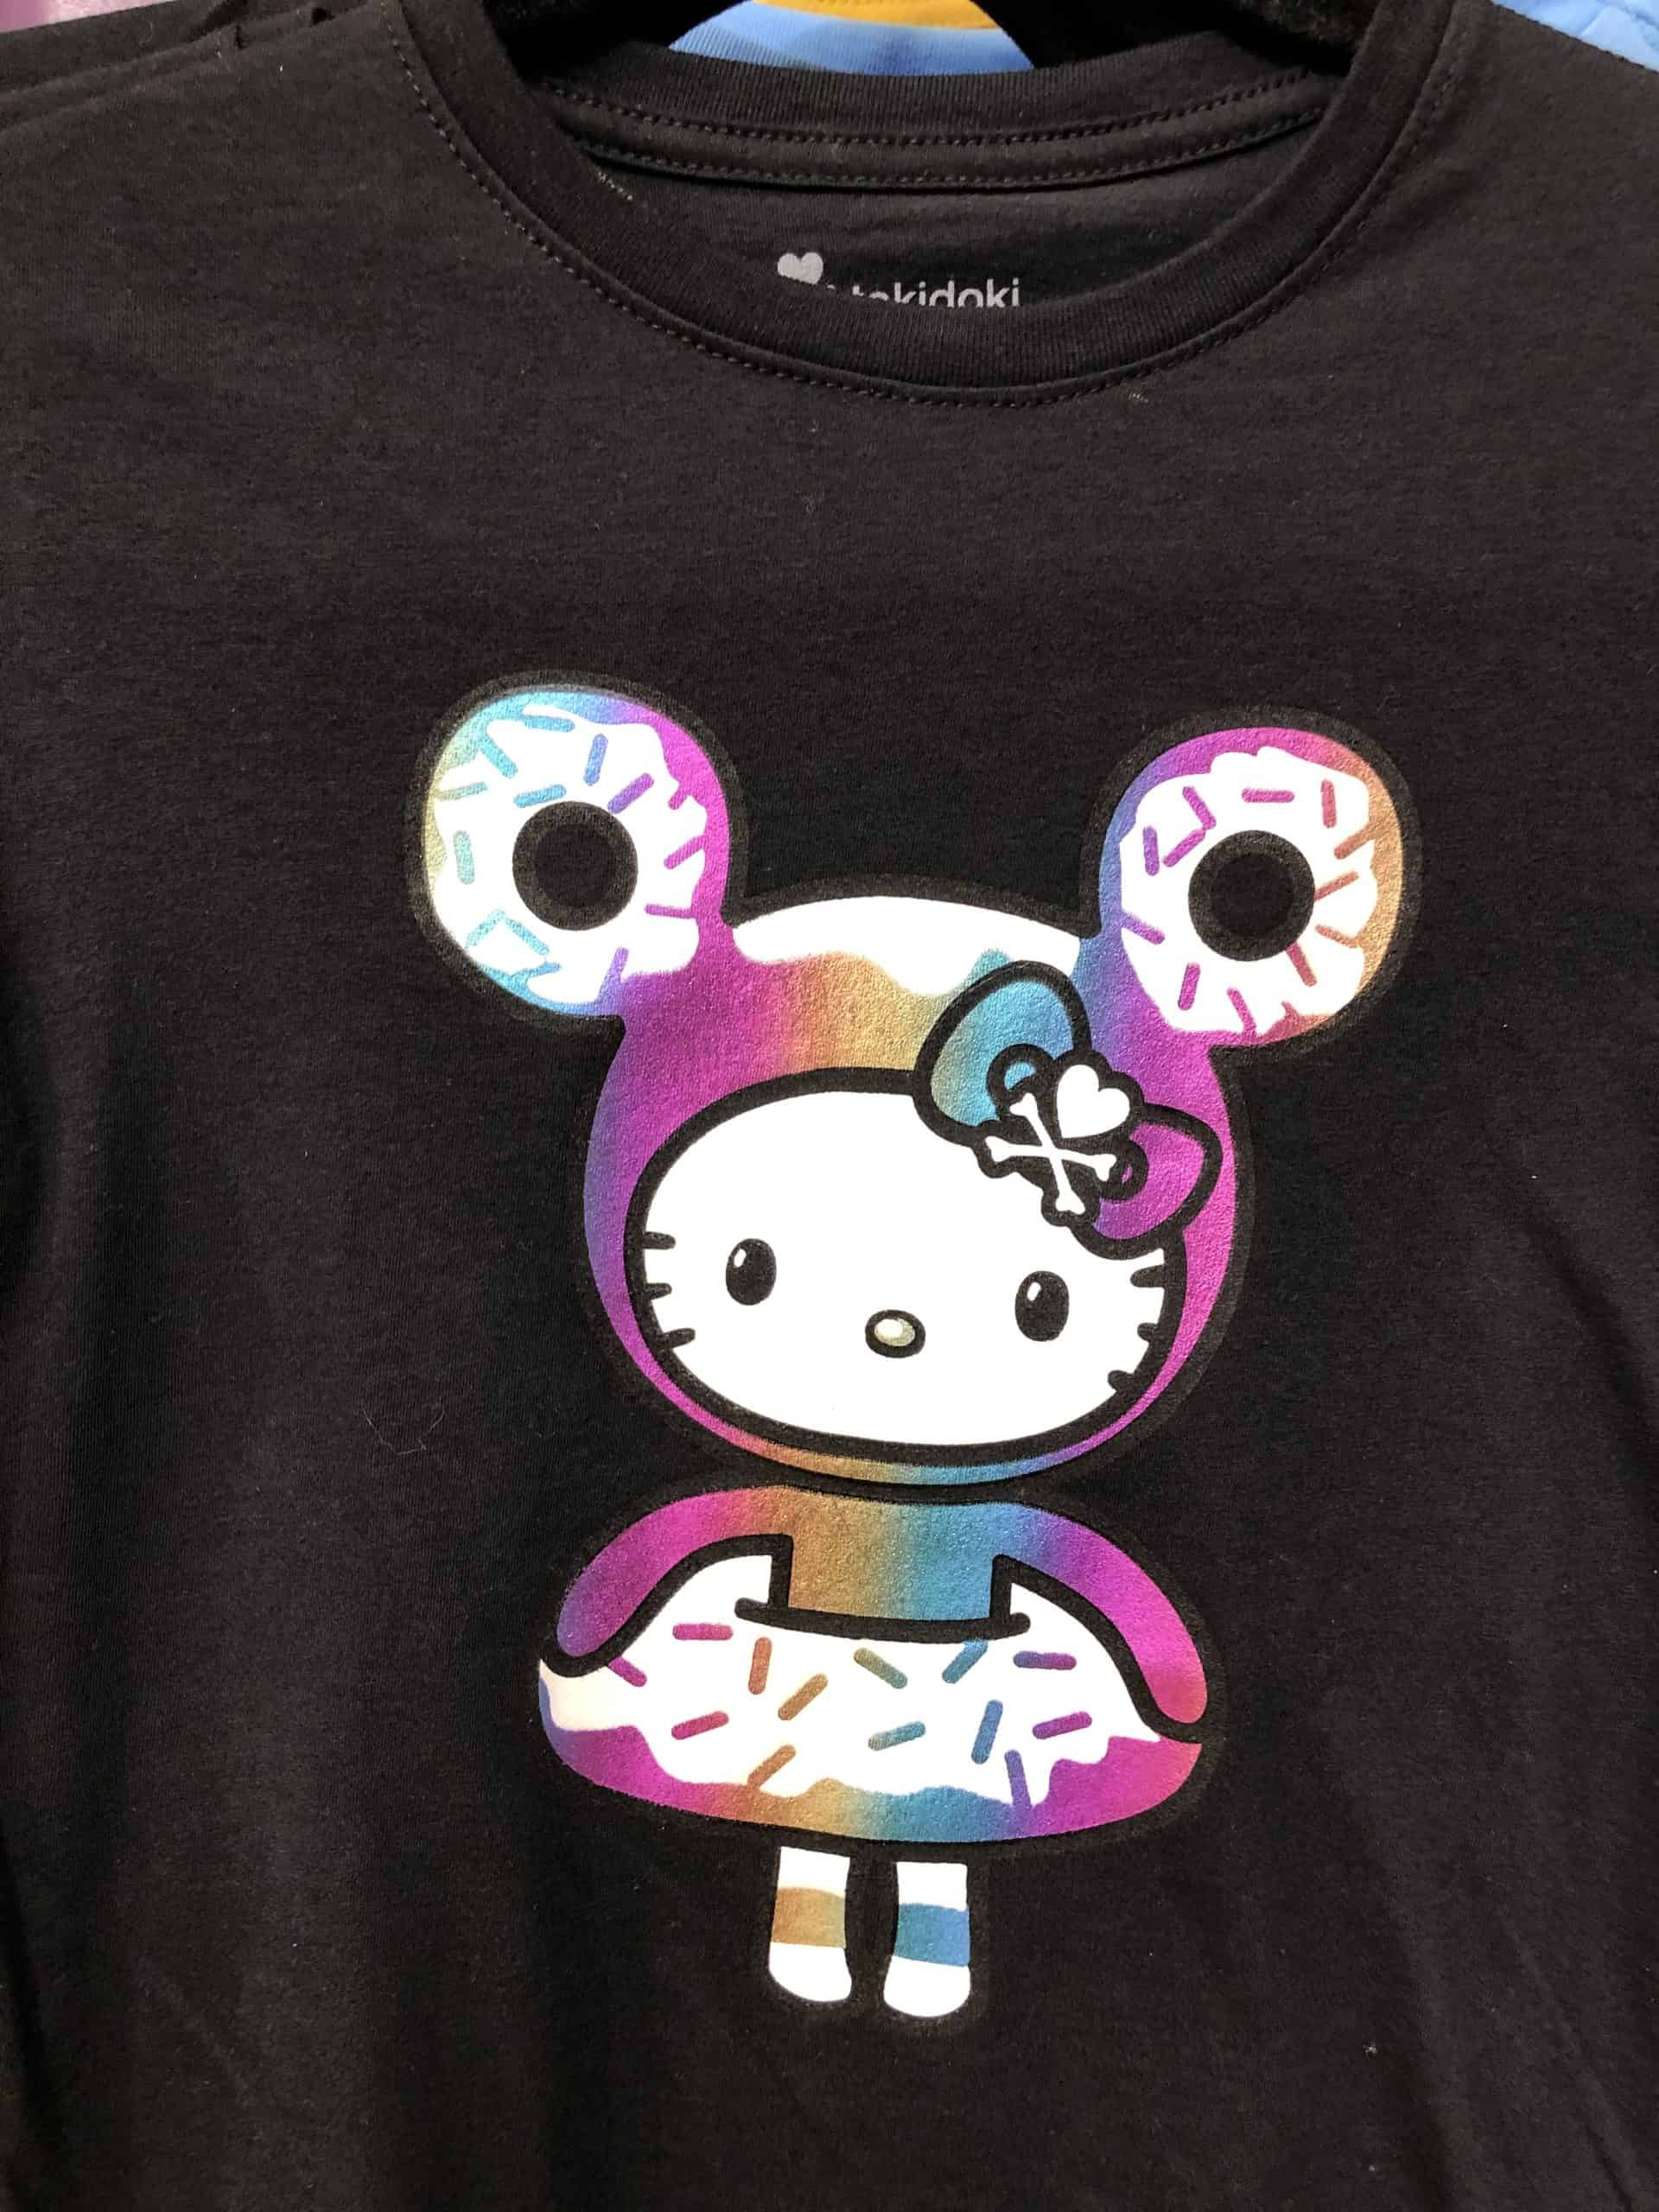 AmikoBoutique tshirt